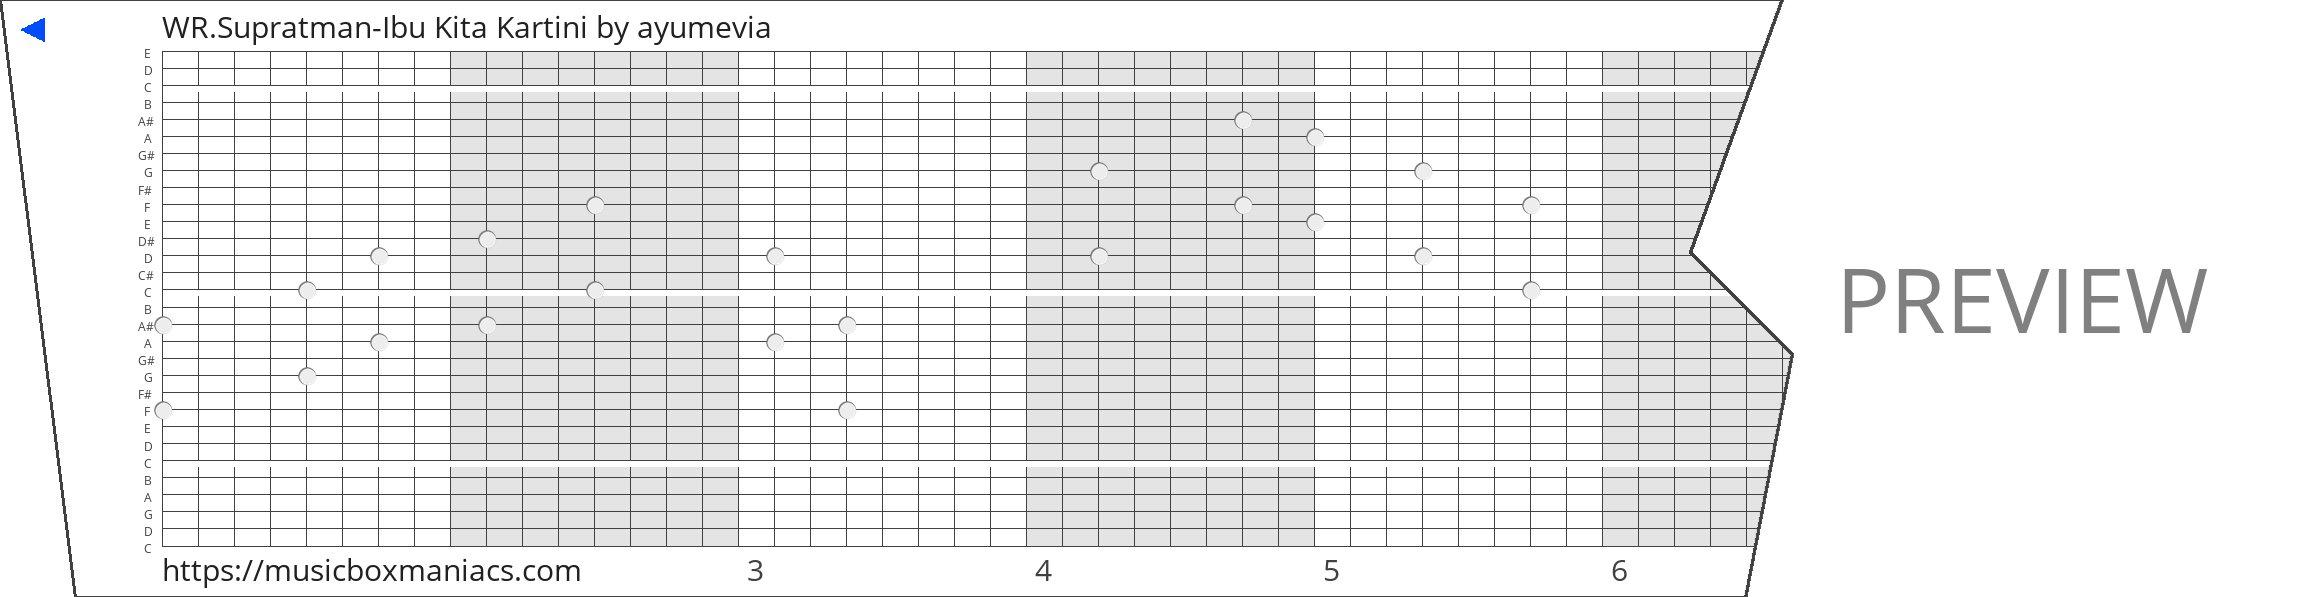 WR.Supratman-Ibu Kita Kartini 30 note music box paper strip